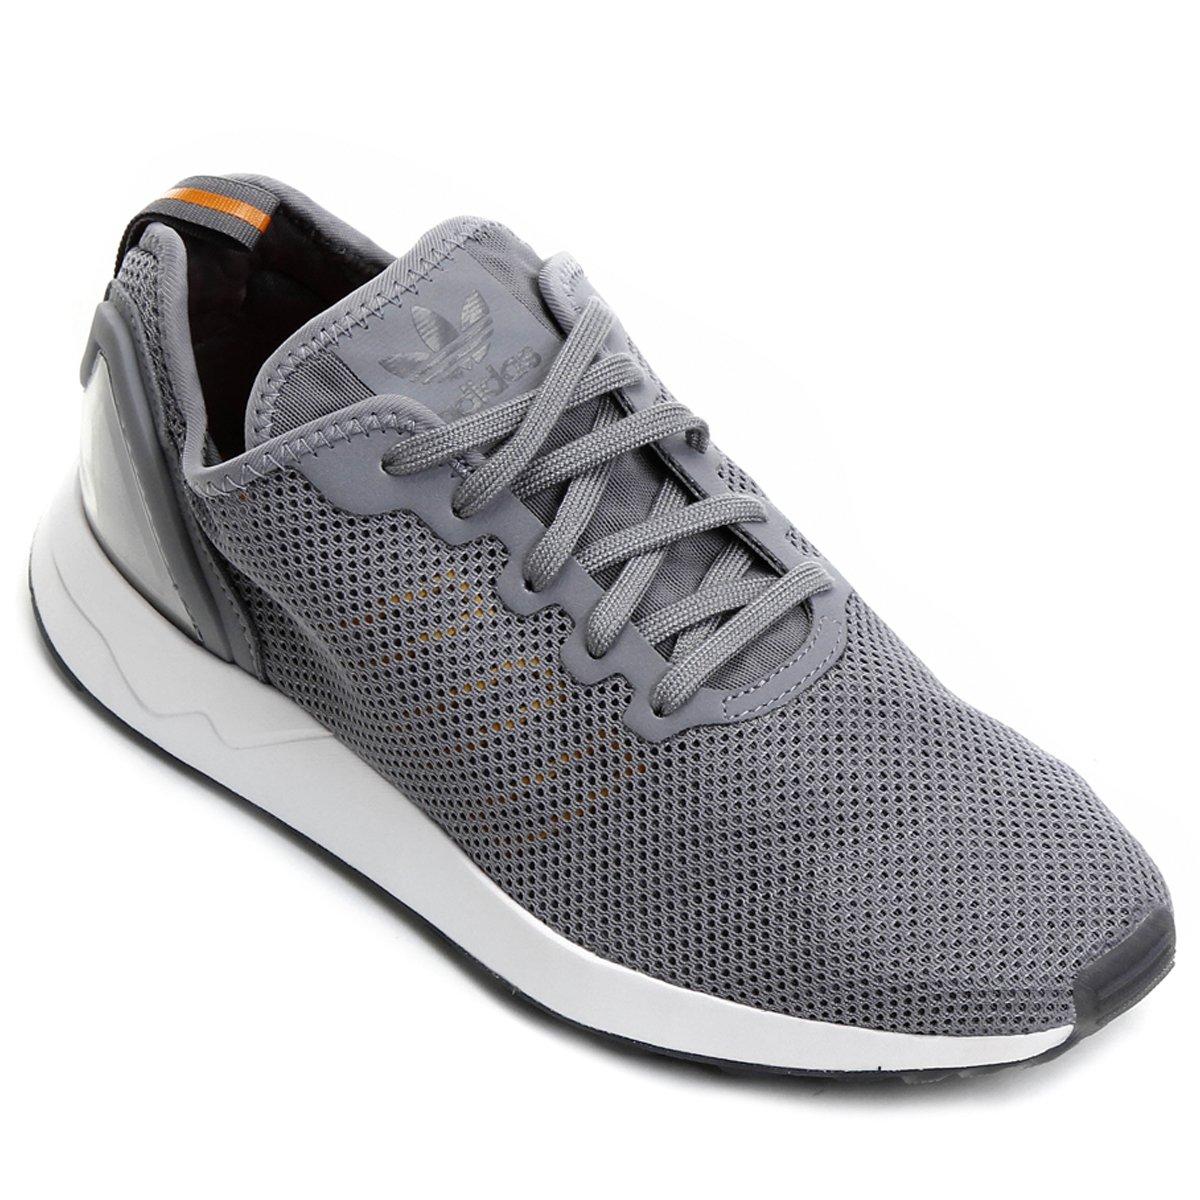 the best attitude 3f46a 65e85 ... greece tênis adidas zx flux adv racer sl compre agora netshoes d7e54  1f085